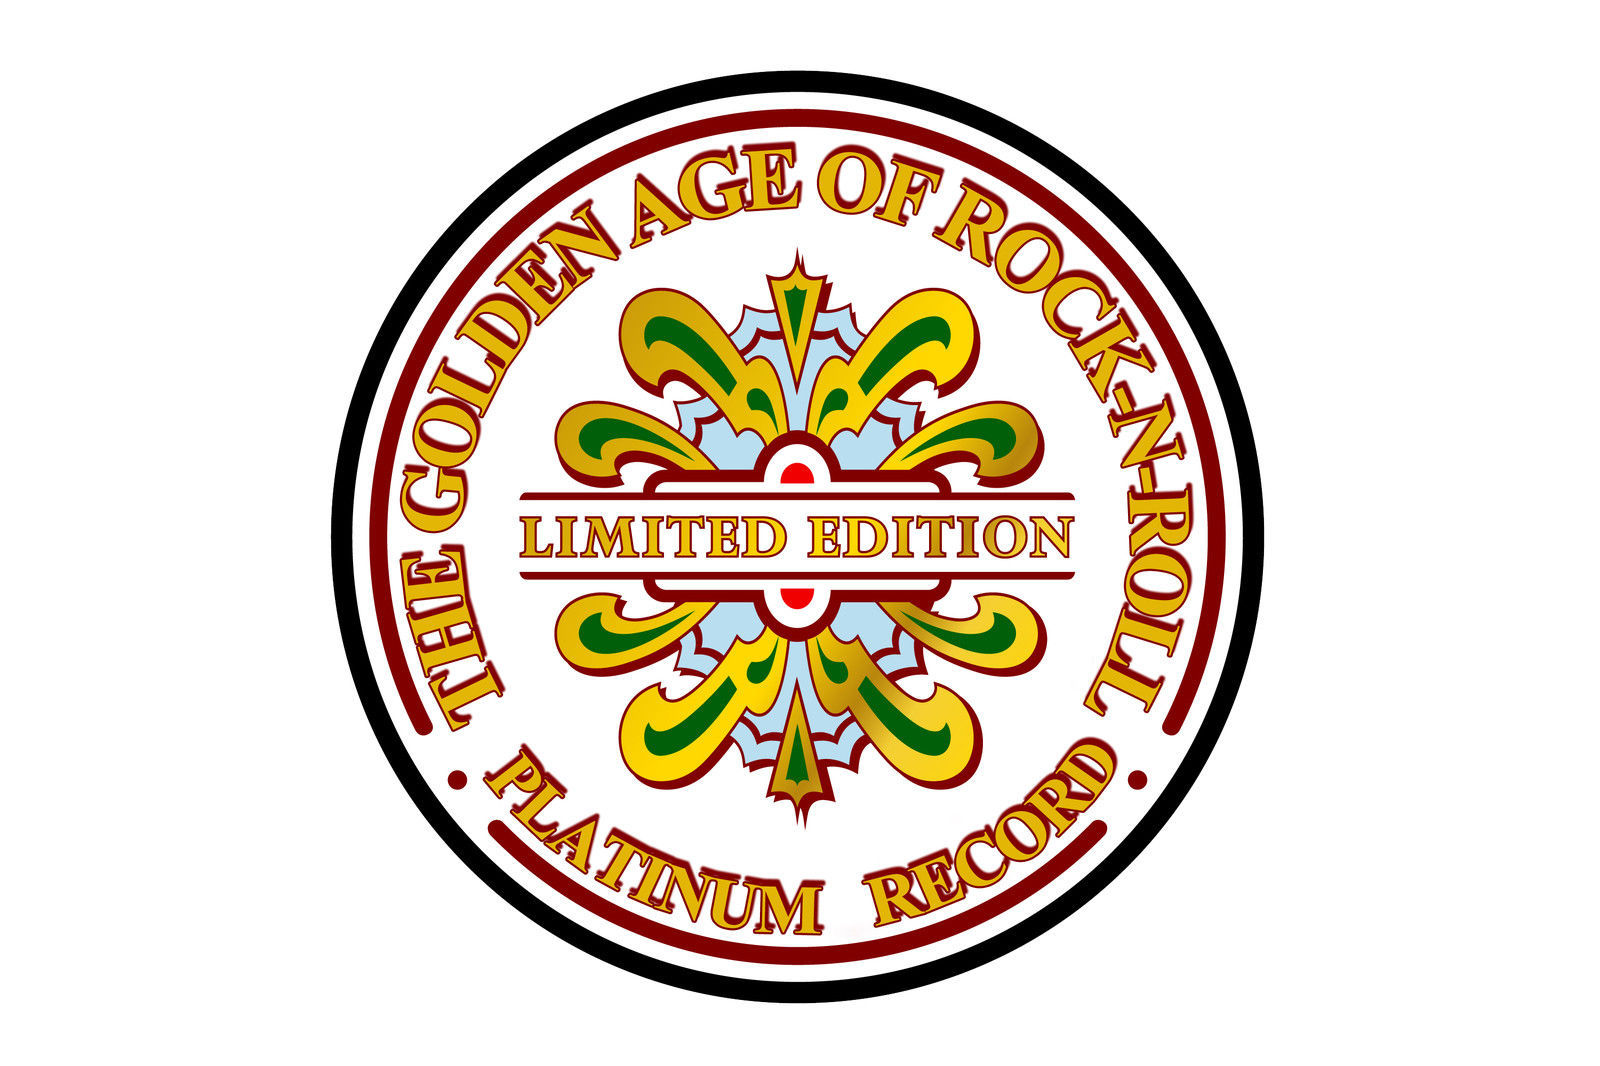 NIRVANA PLATINUM RECORD LTD EDITION RARE COLLECTIBLE  MUSIC GIFT AWARD